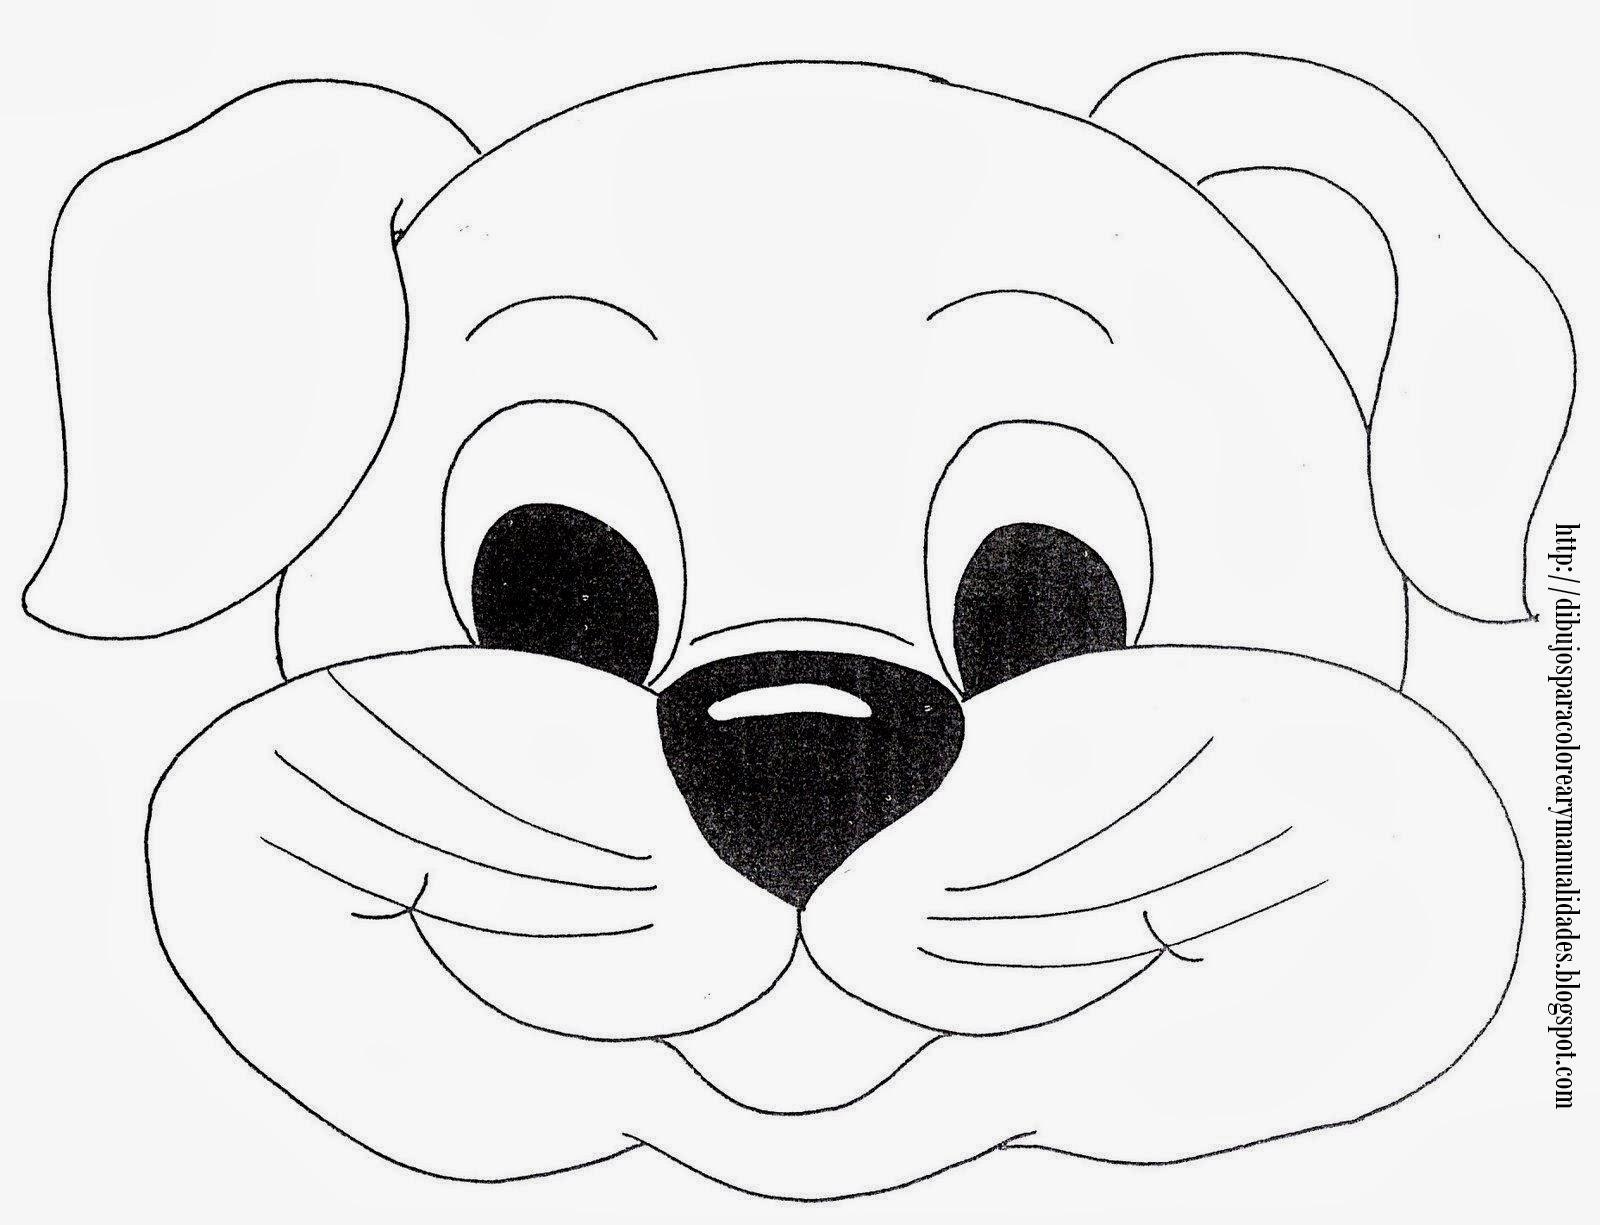 Imagenes De Perros Para Dibujar